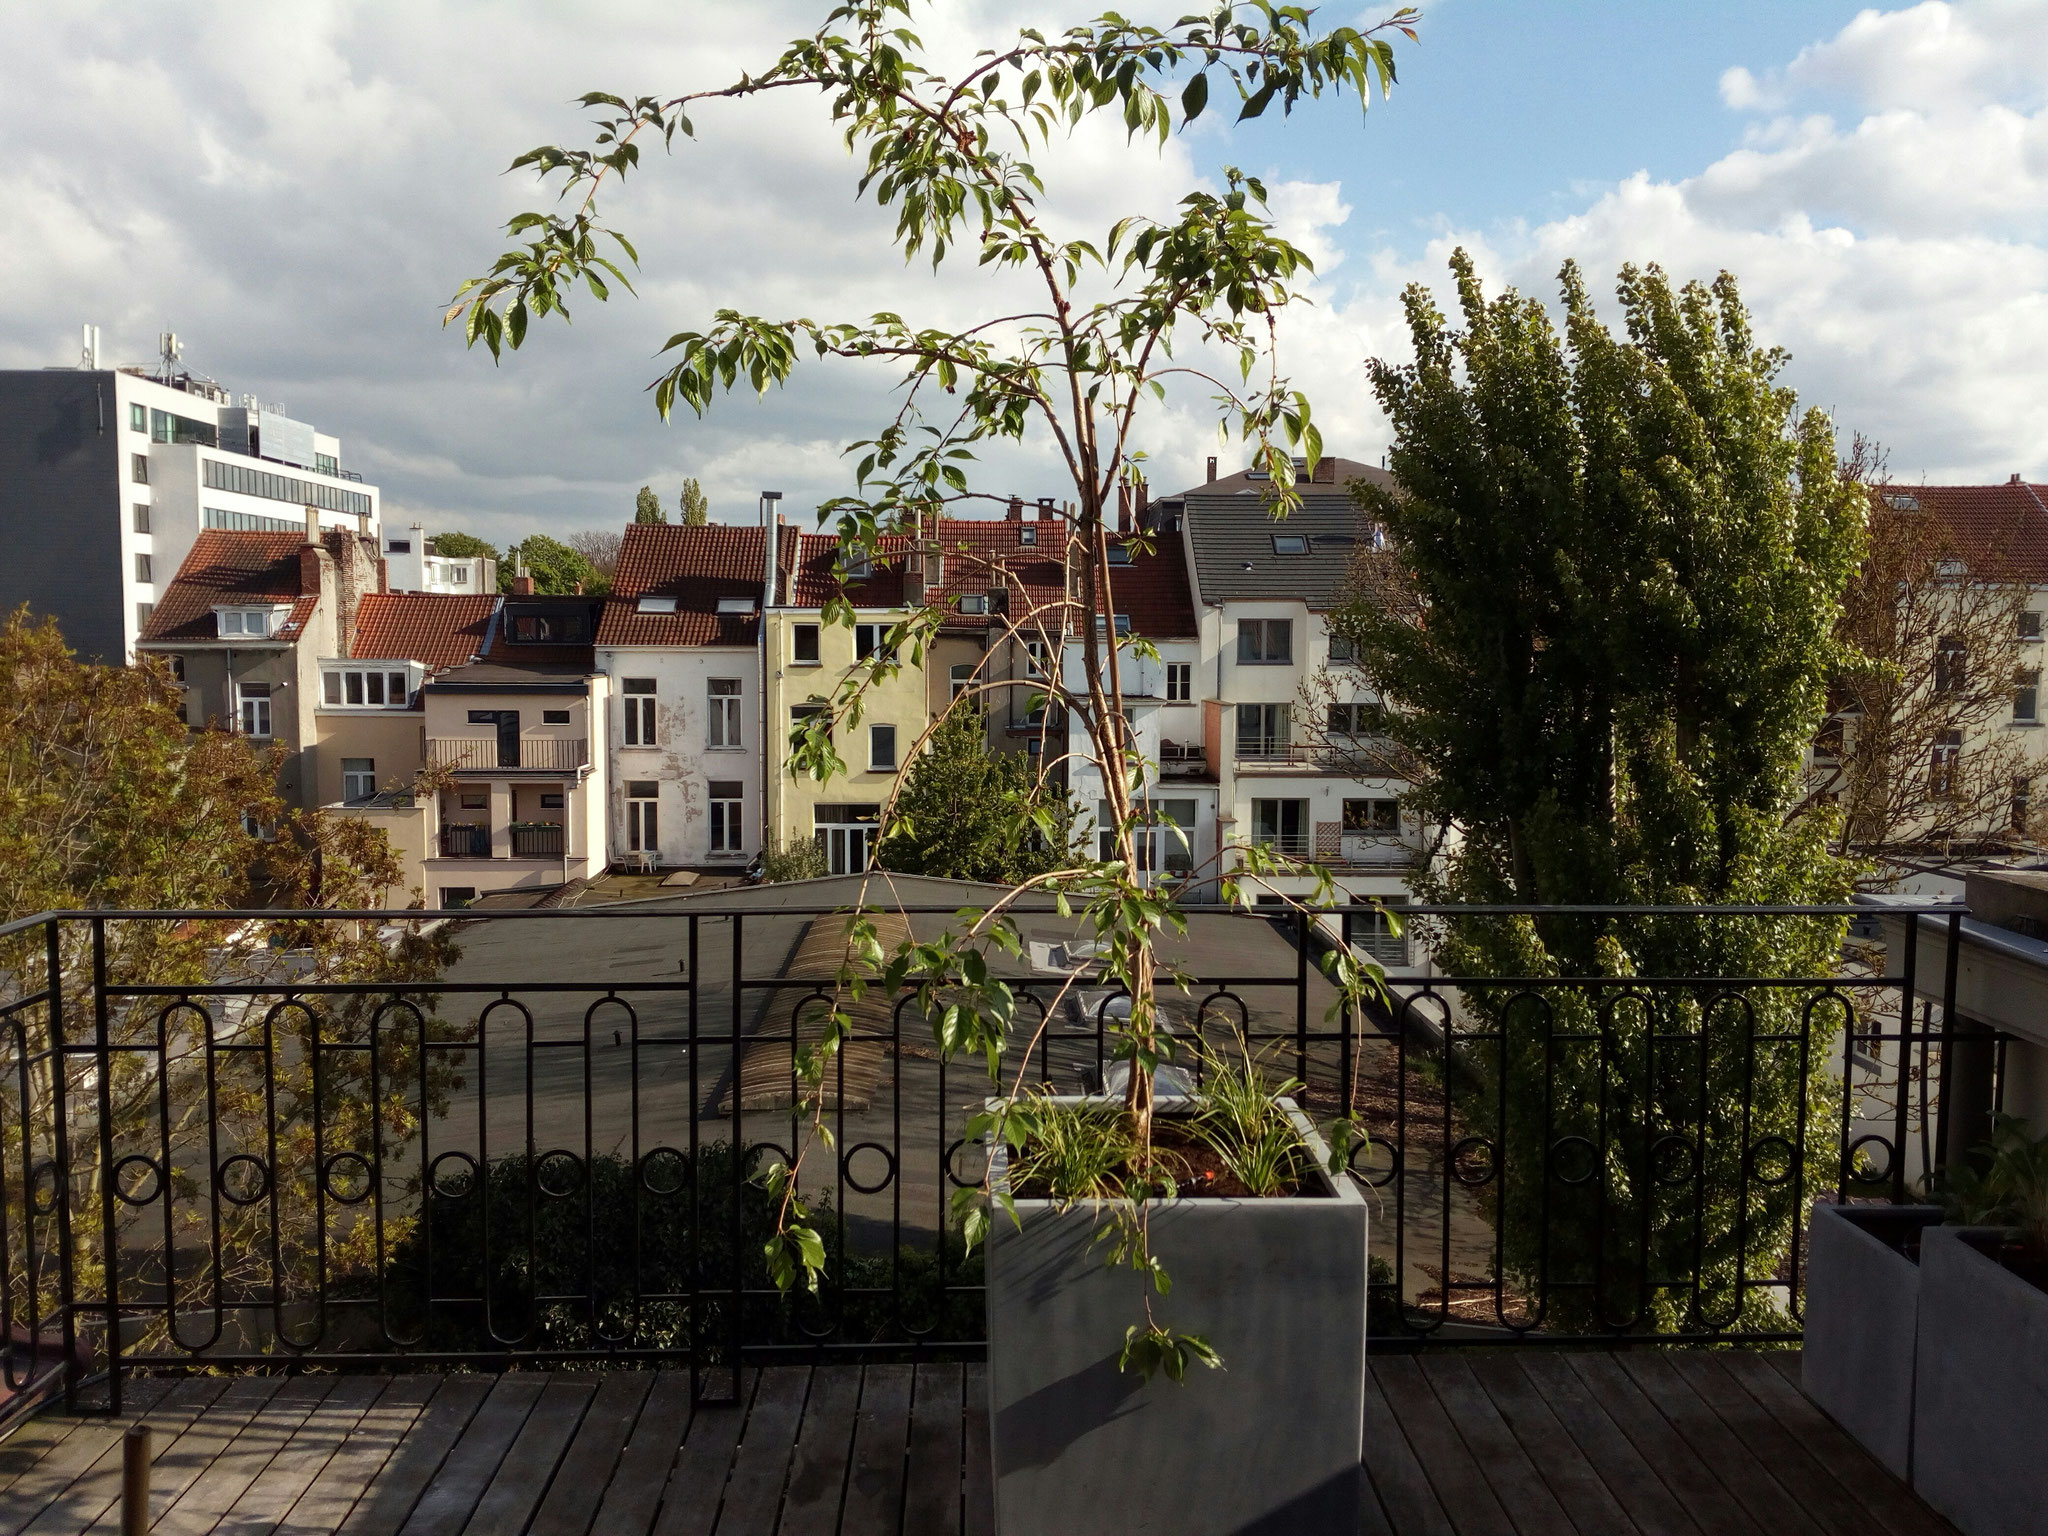 Terrasse 30m2 - Ambiance verger fleuri - Face - Amenagement jardin Bruxelles